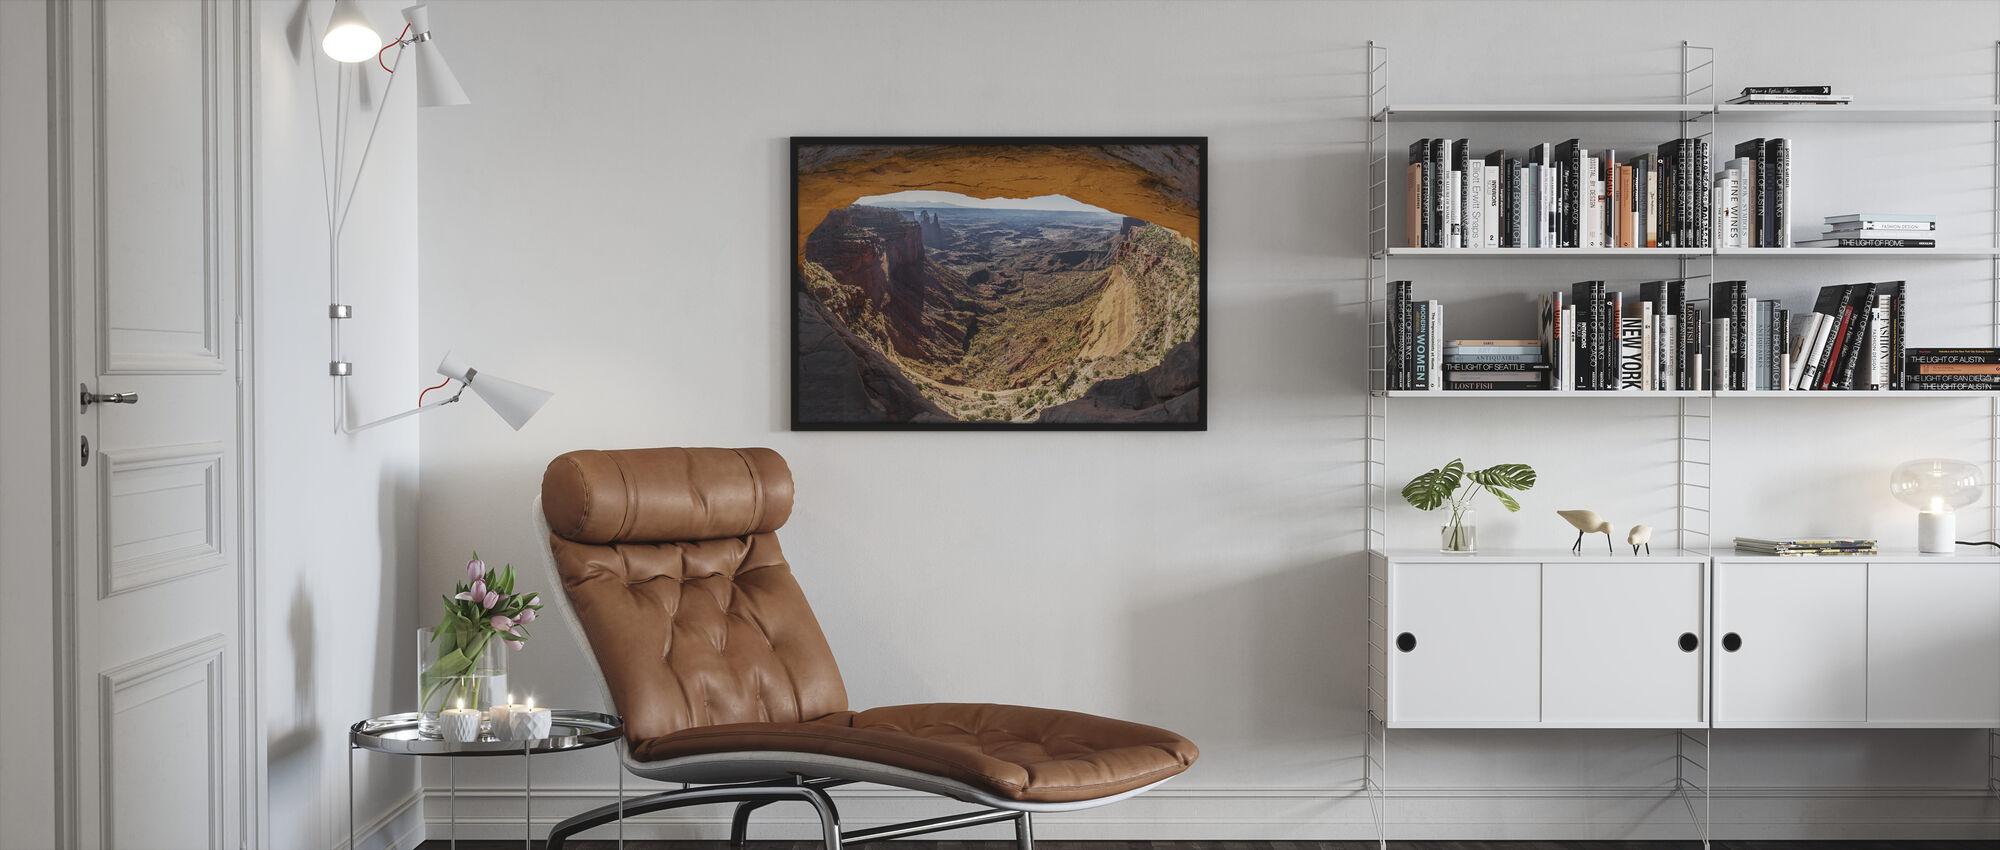 Mesa Arch - Framed print - Living Room